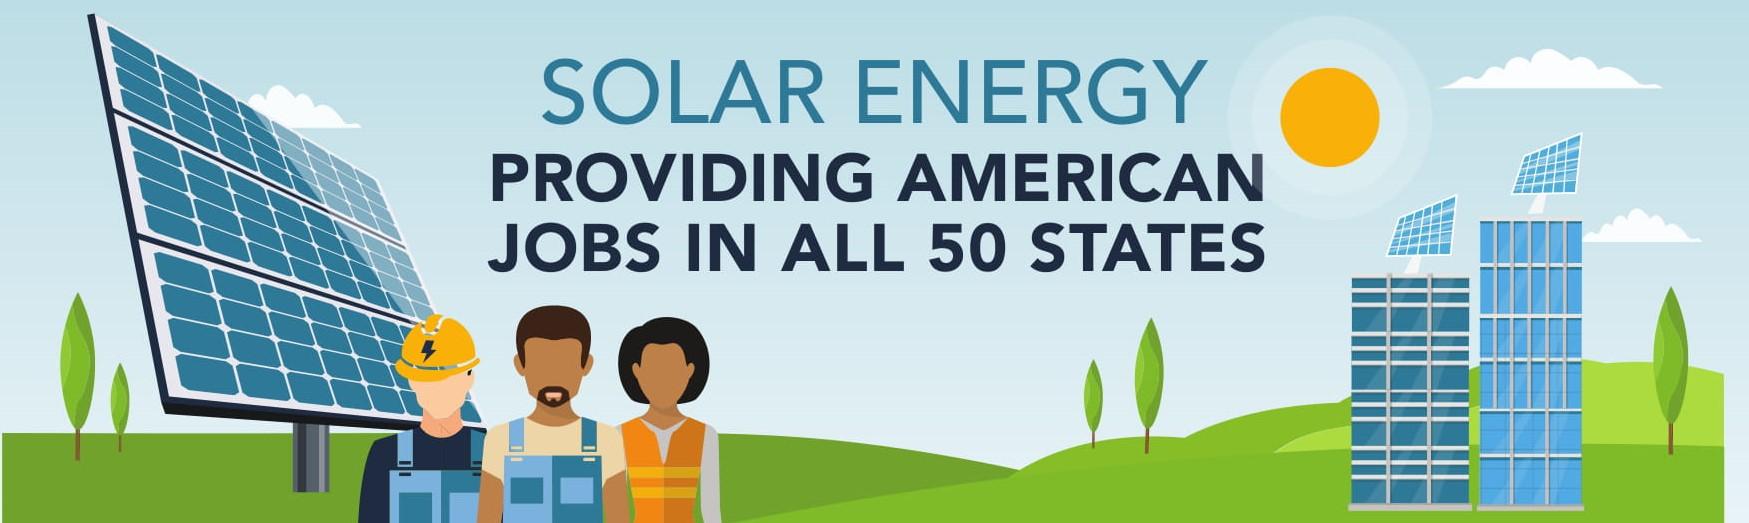 Tariffs Take a Bite Out of American Solar Jobs | SEIA